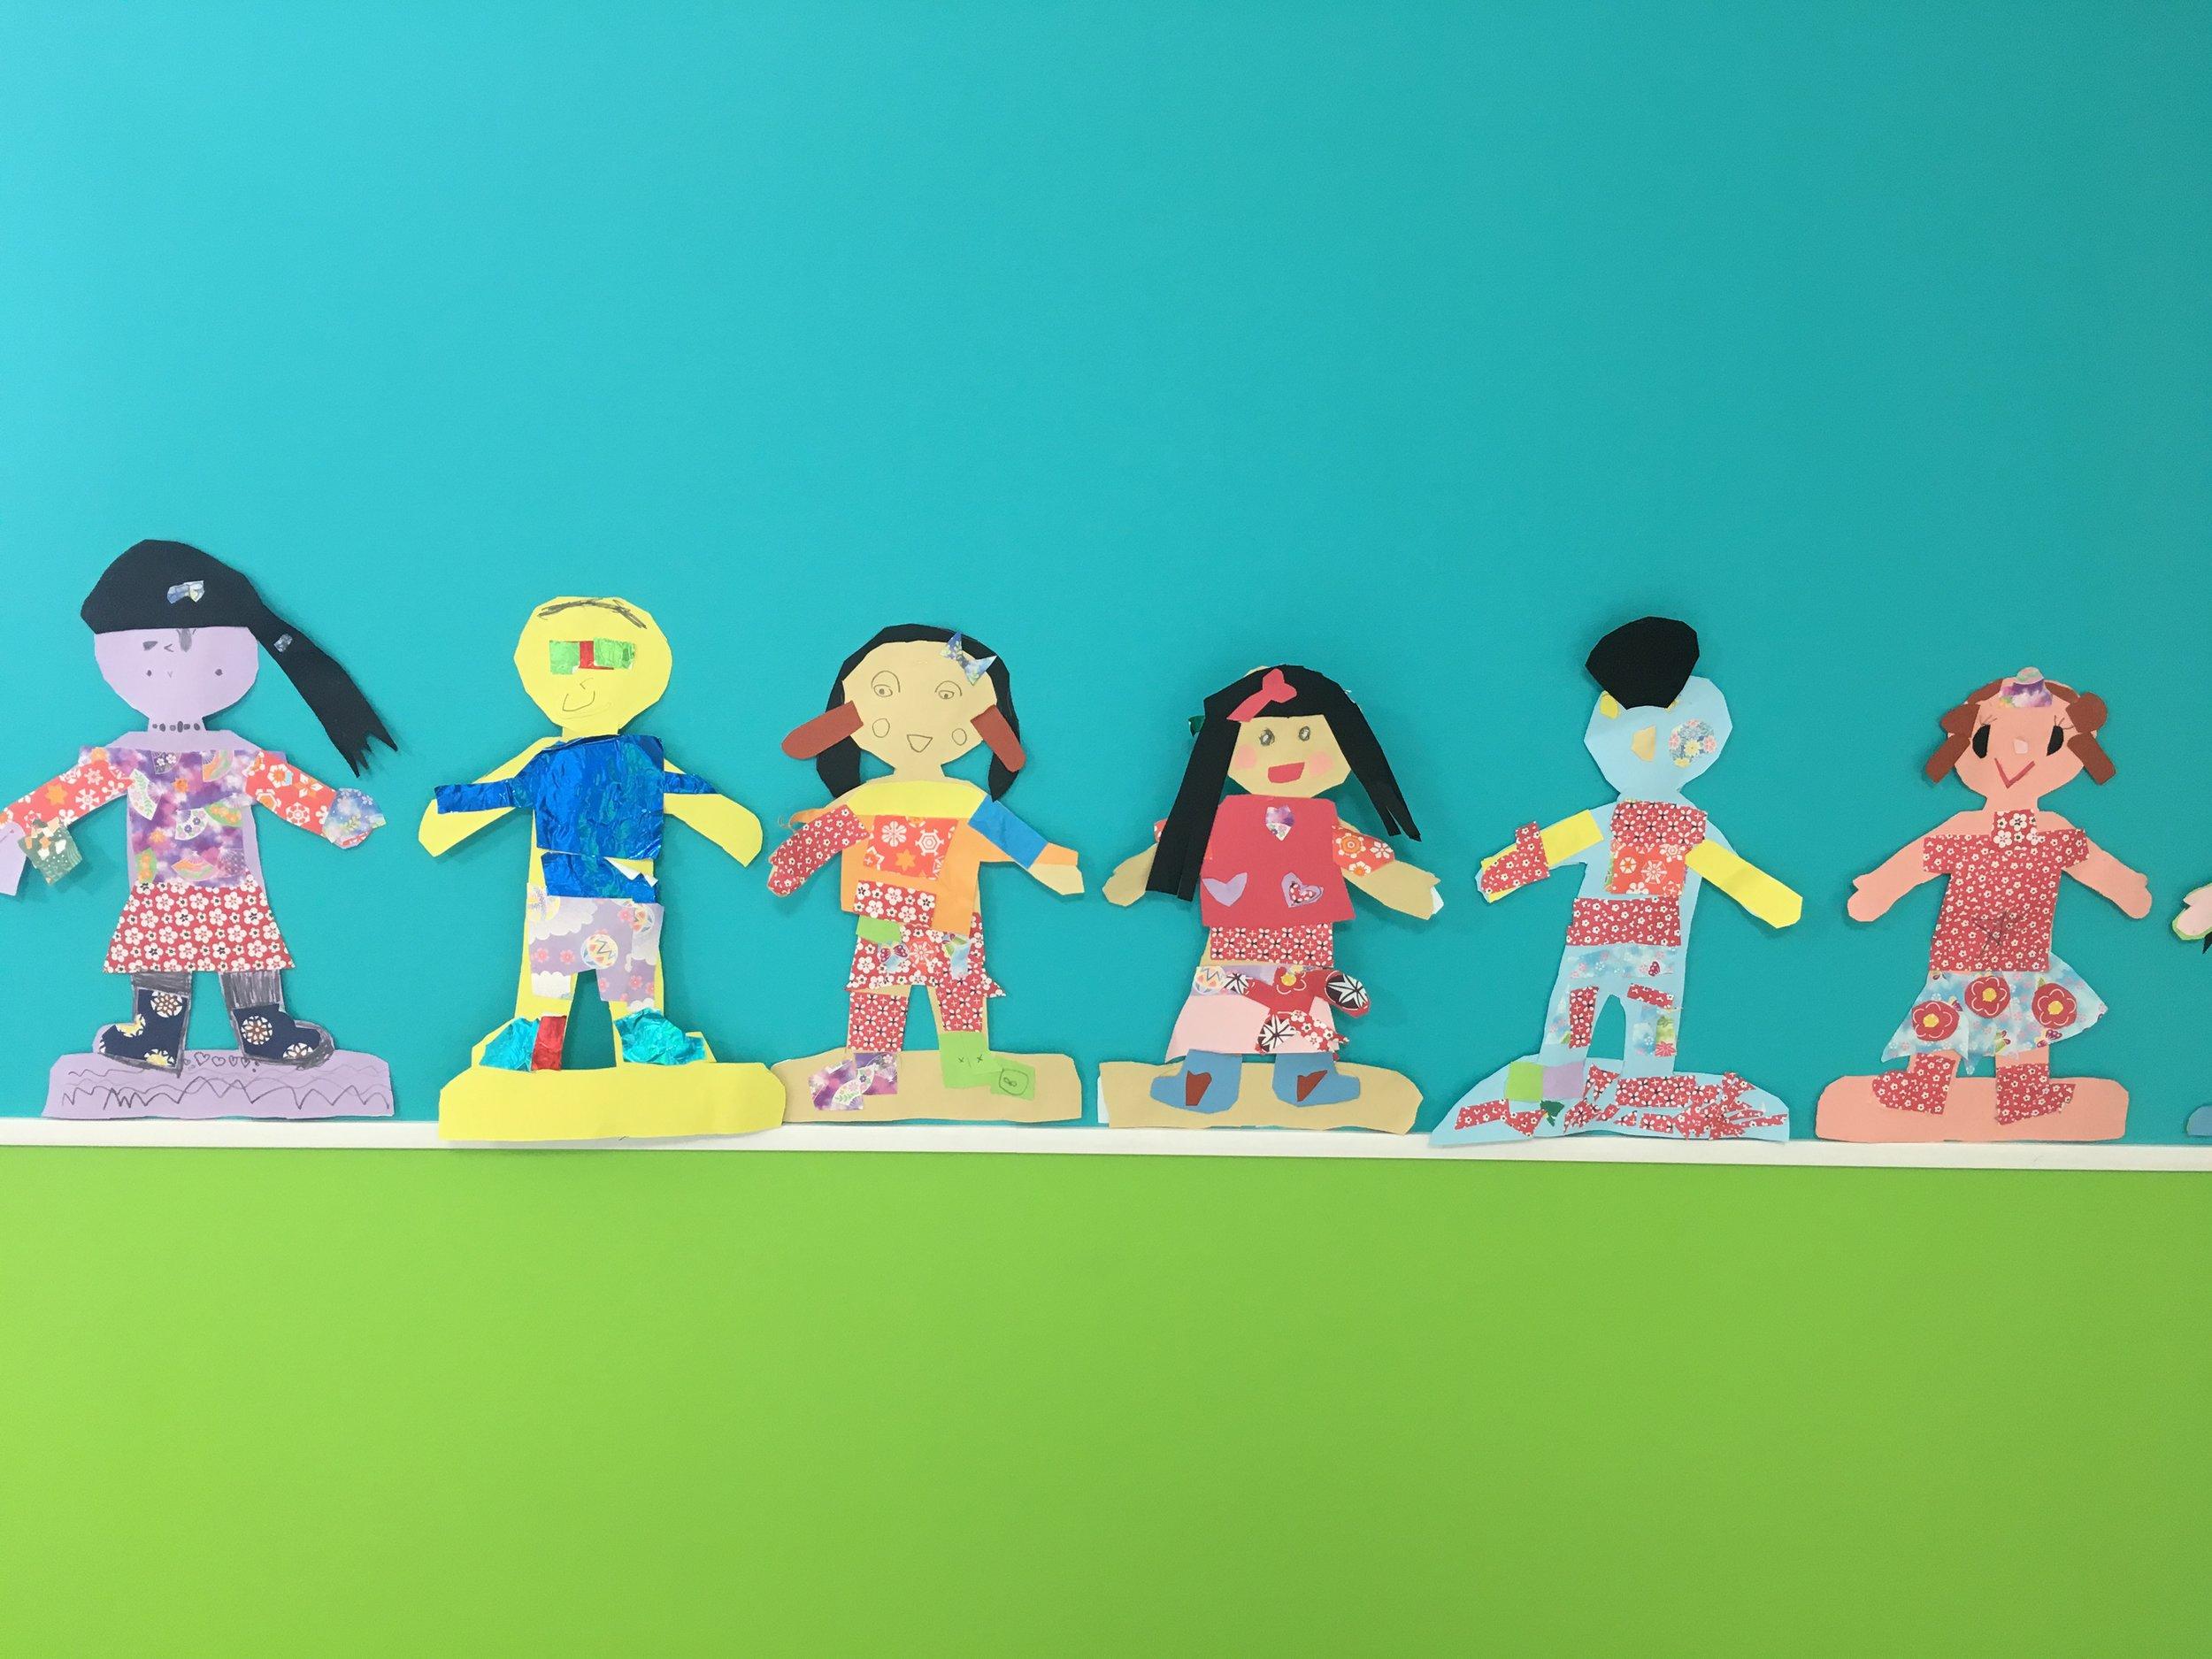 Dressed paper dolls